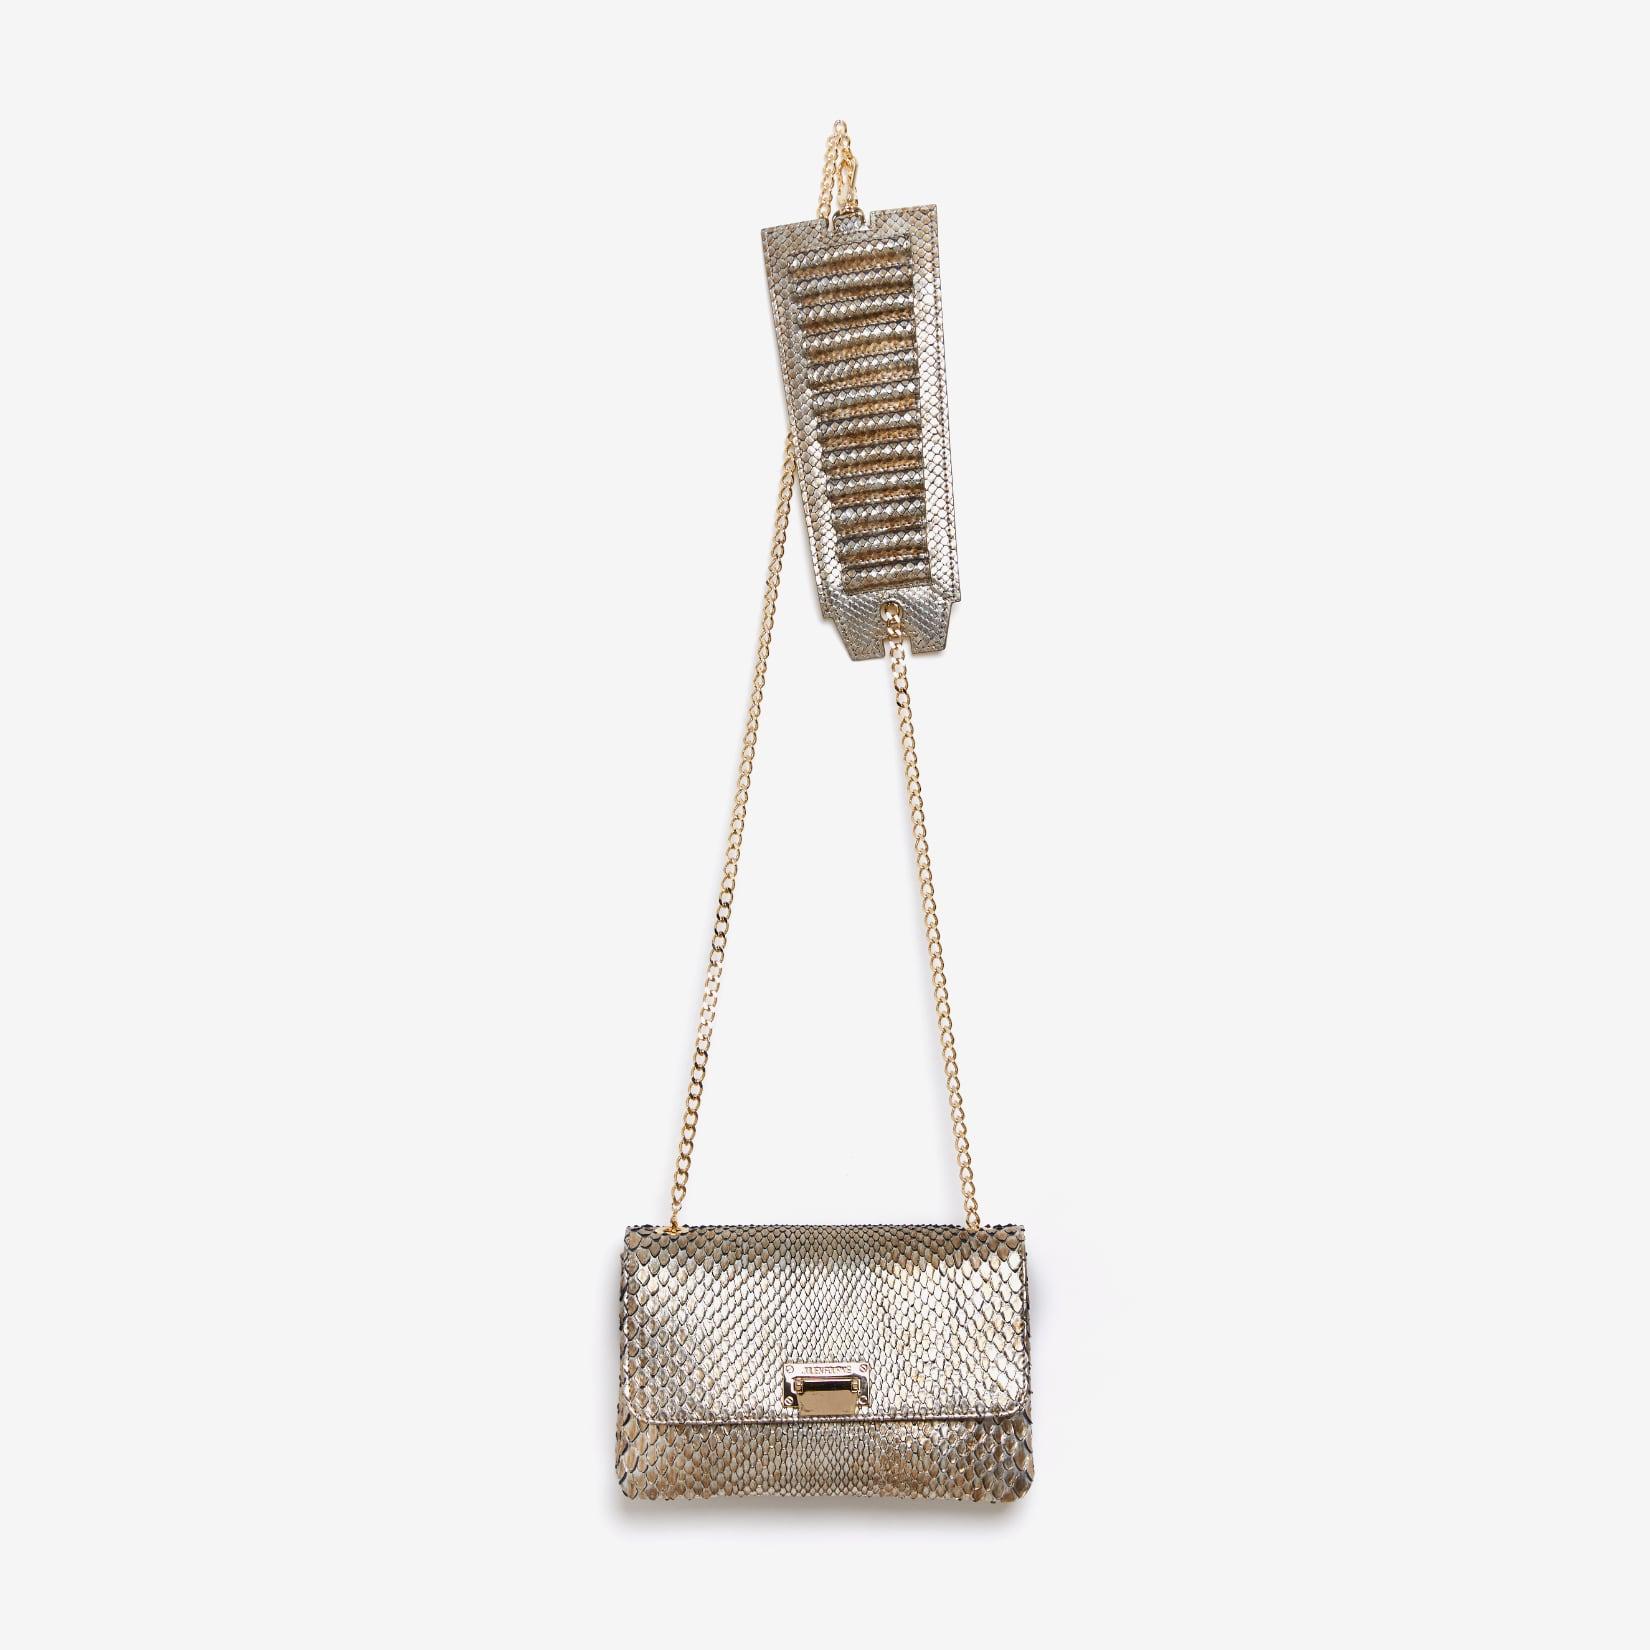 Goldie Handbag